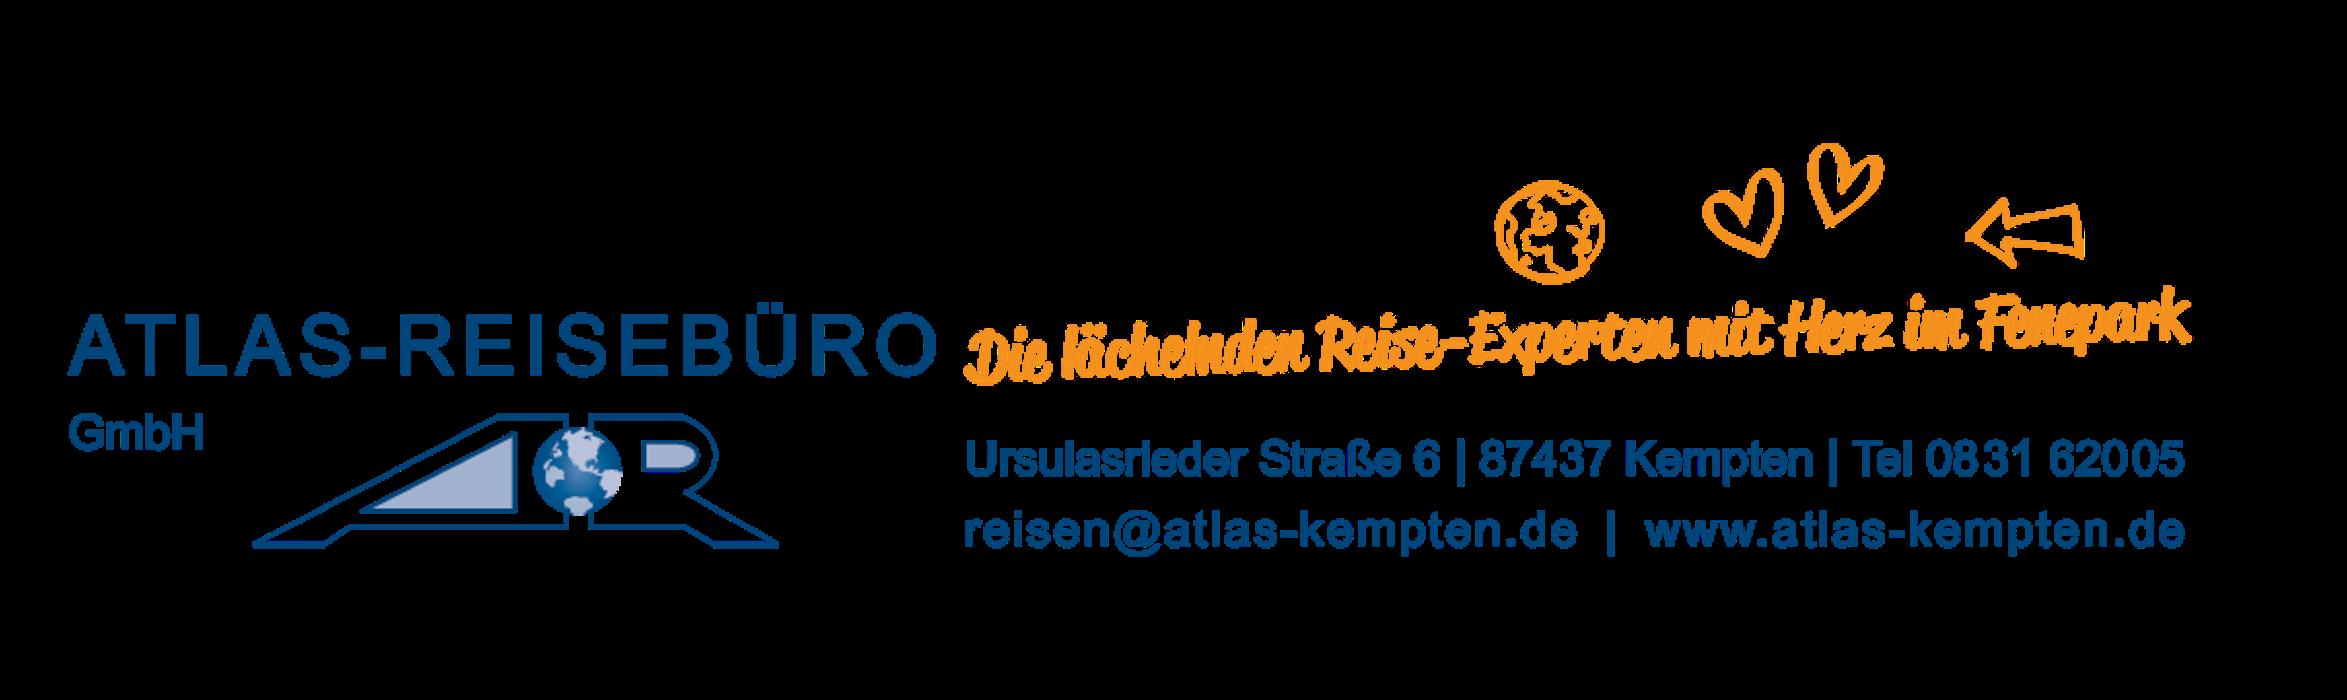 Bild zu ATLAS-REISEBUERO GmbH in Kempten im Allgäu